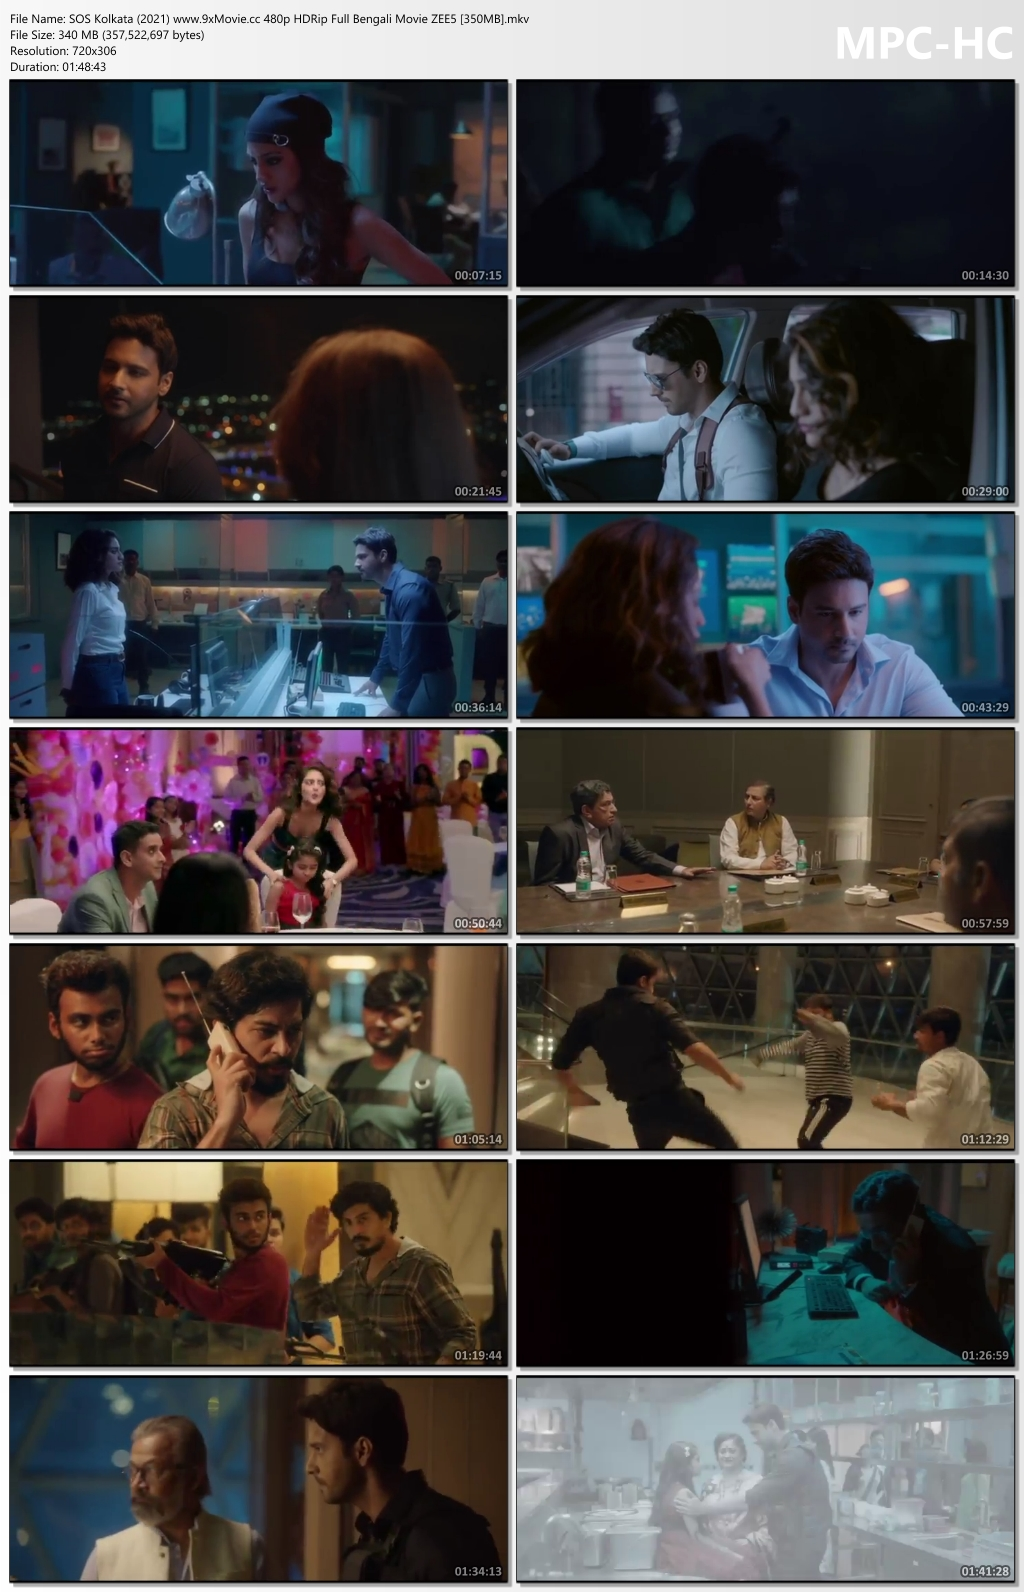 SOS-Kolkata-2021-www-9x-Movie-cc-480p-HDRip-Full-Bengali-Movie-ZEE5-350-MB-mkv